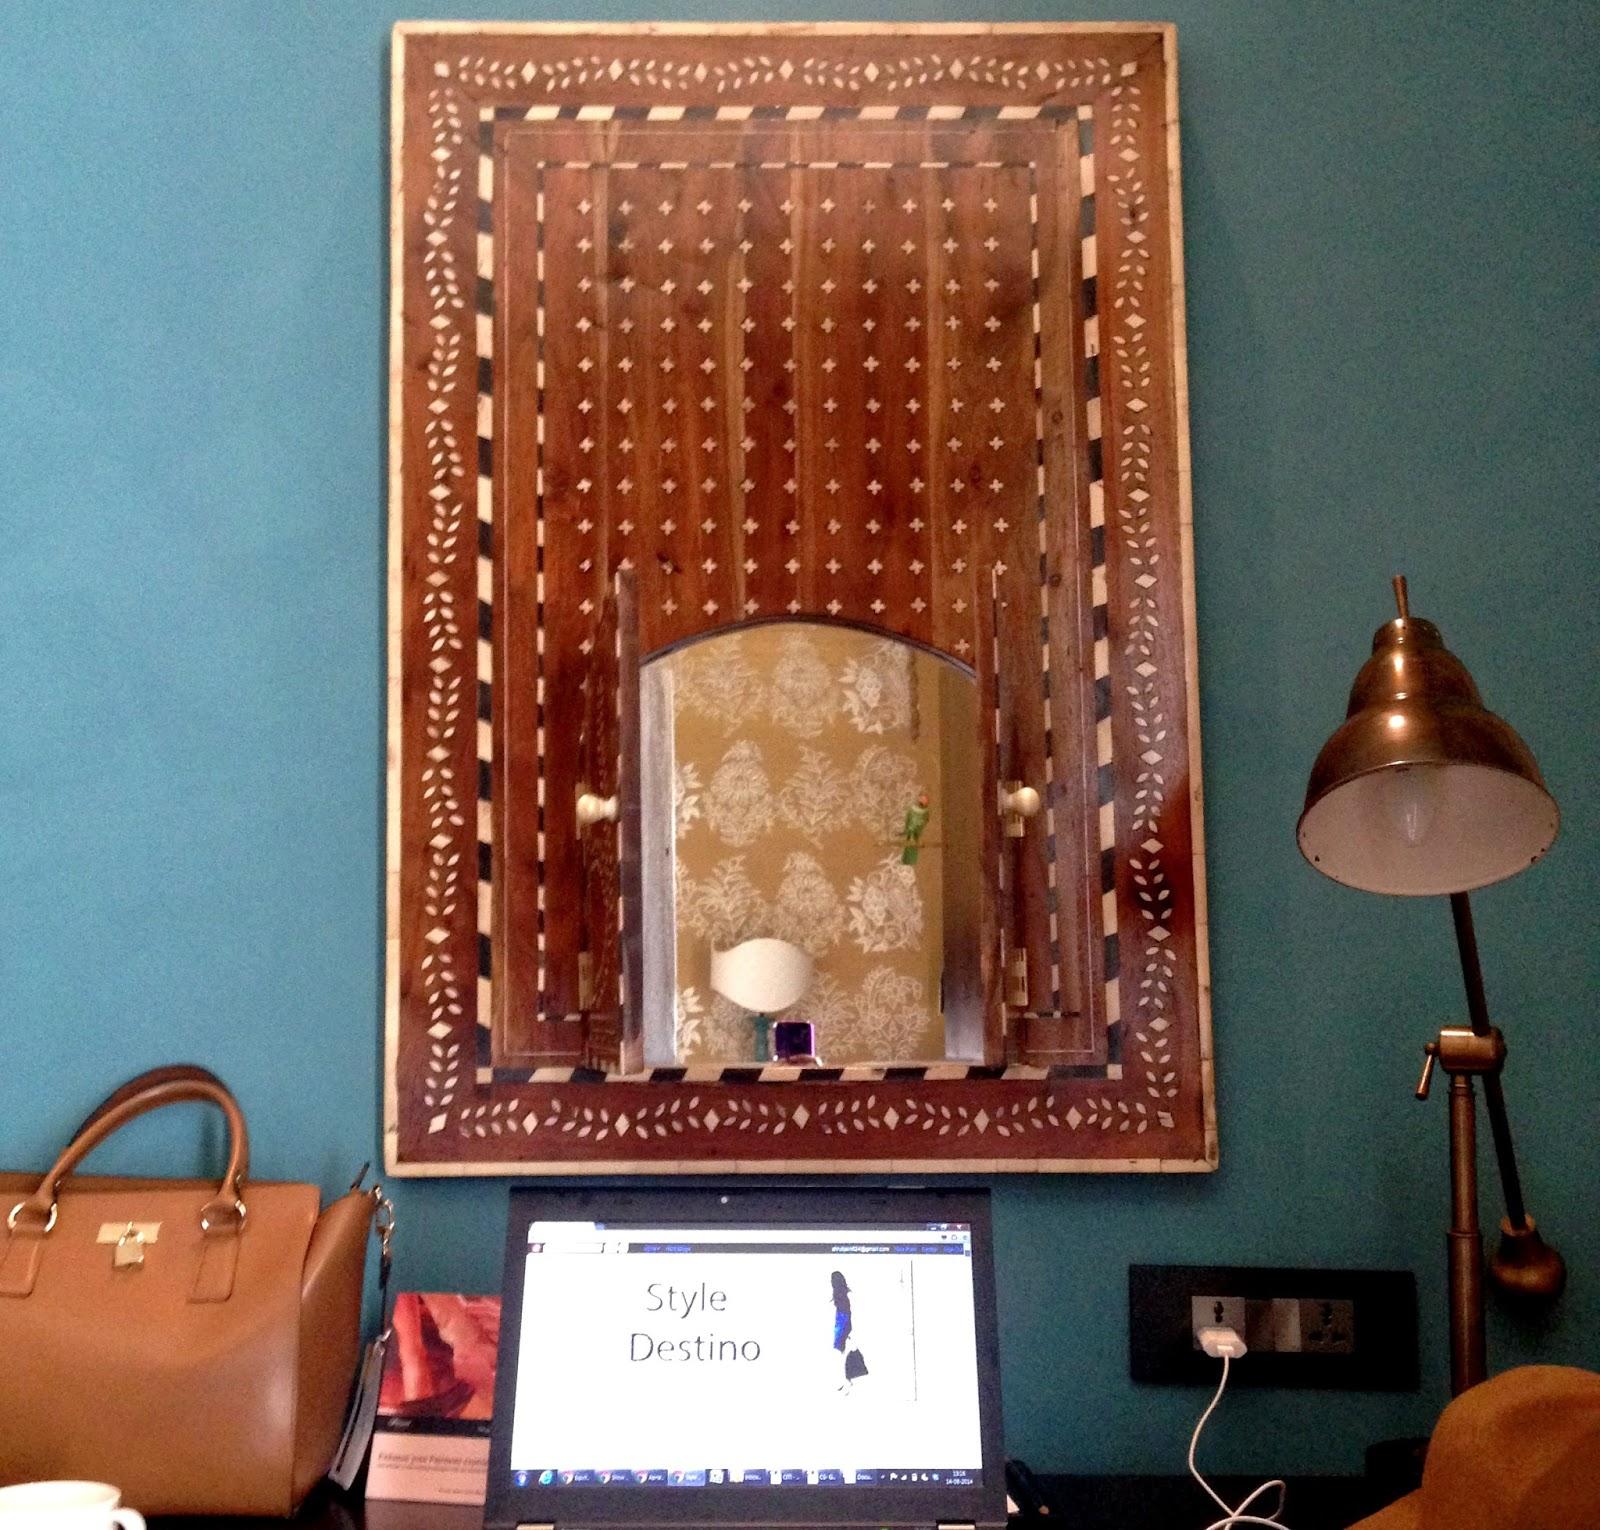 Style Destino at Fairmont Hotel Jaipur